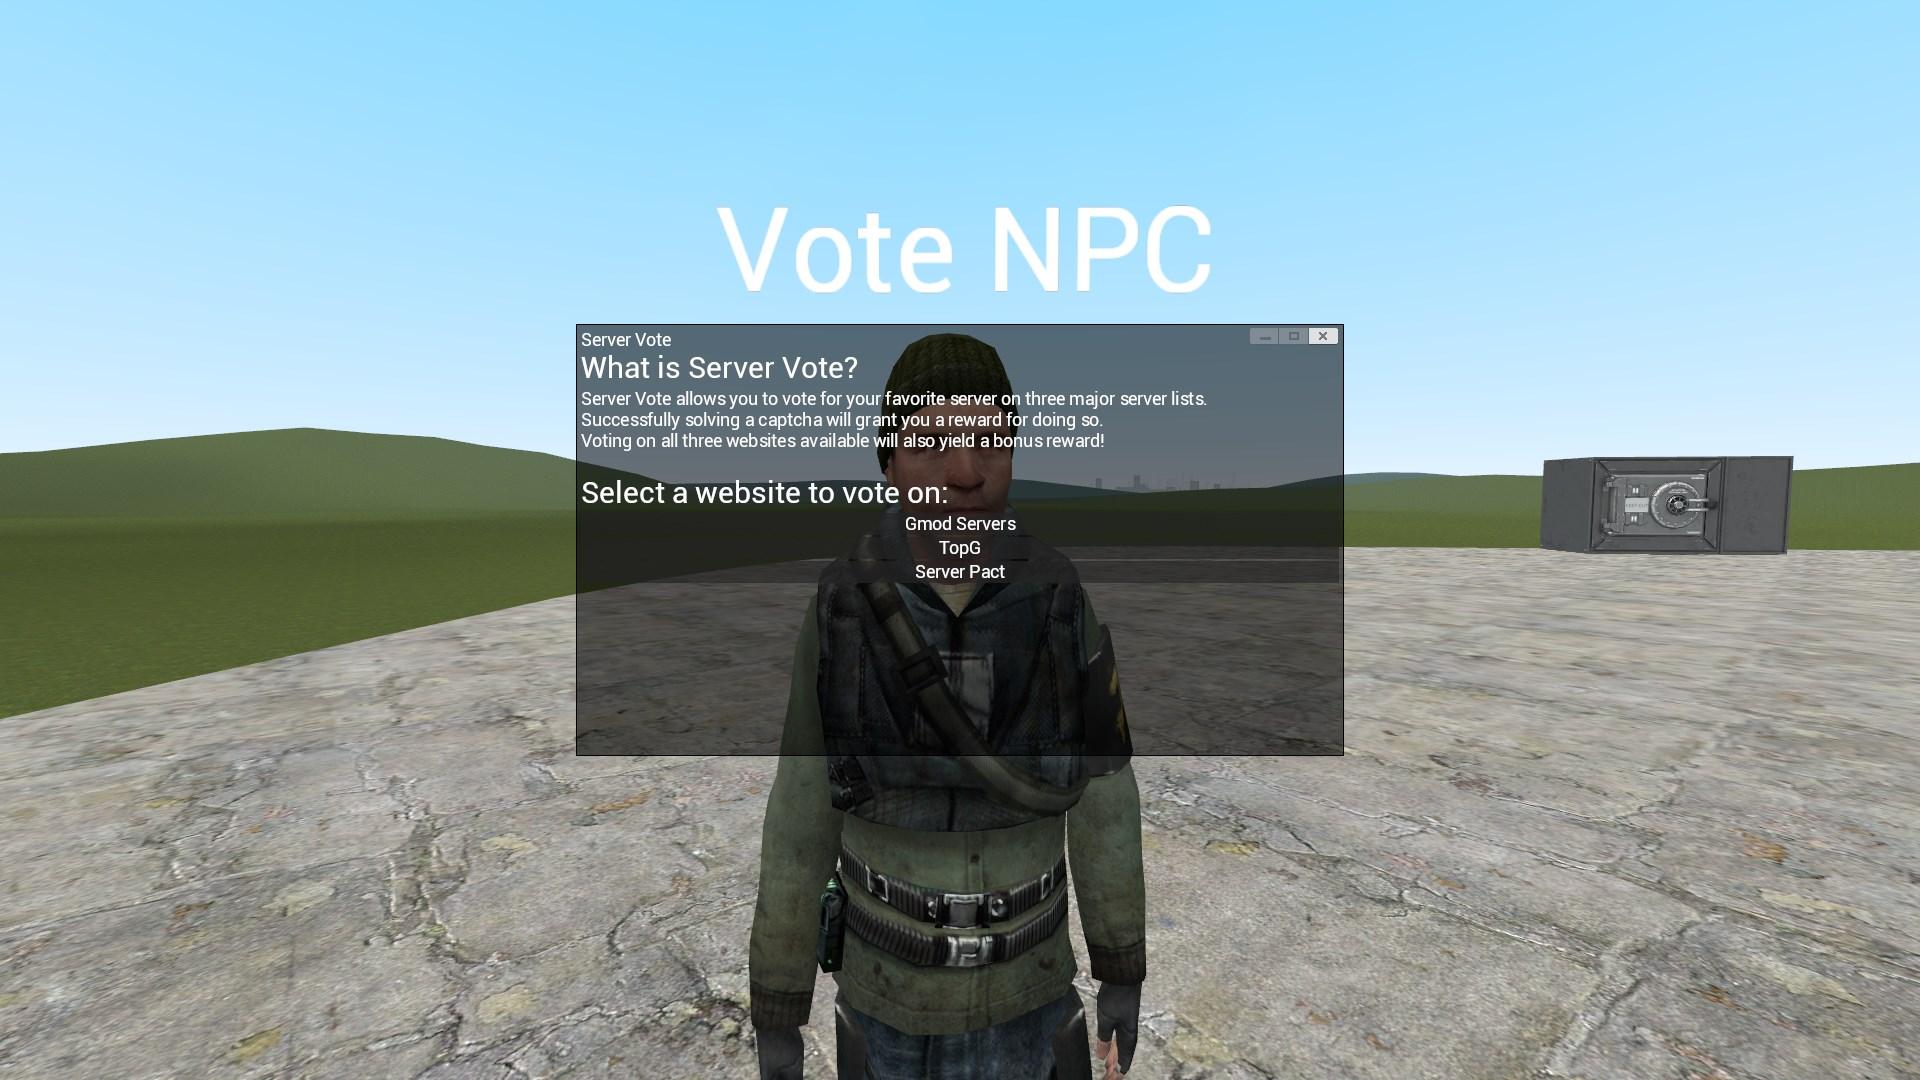 Server Vote